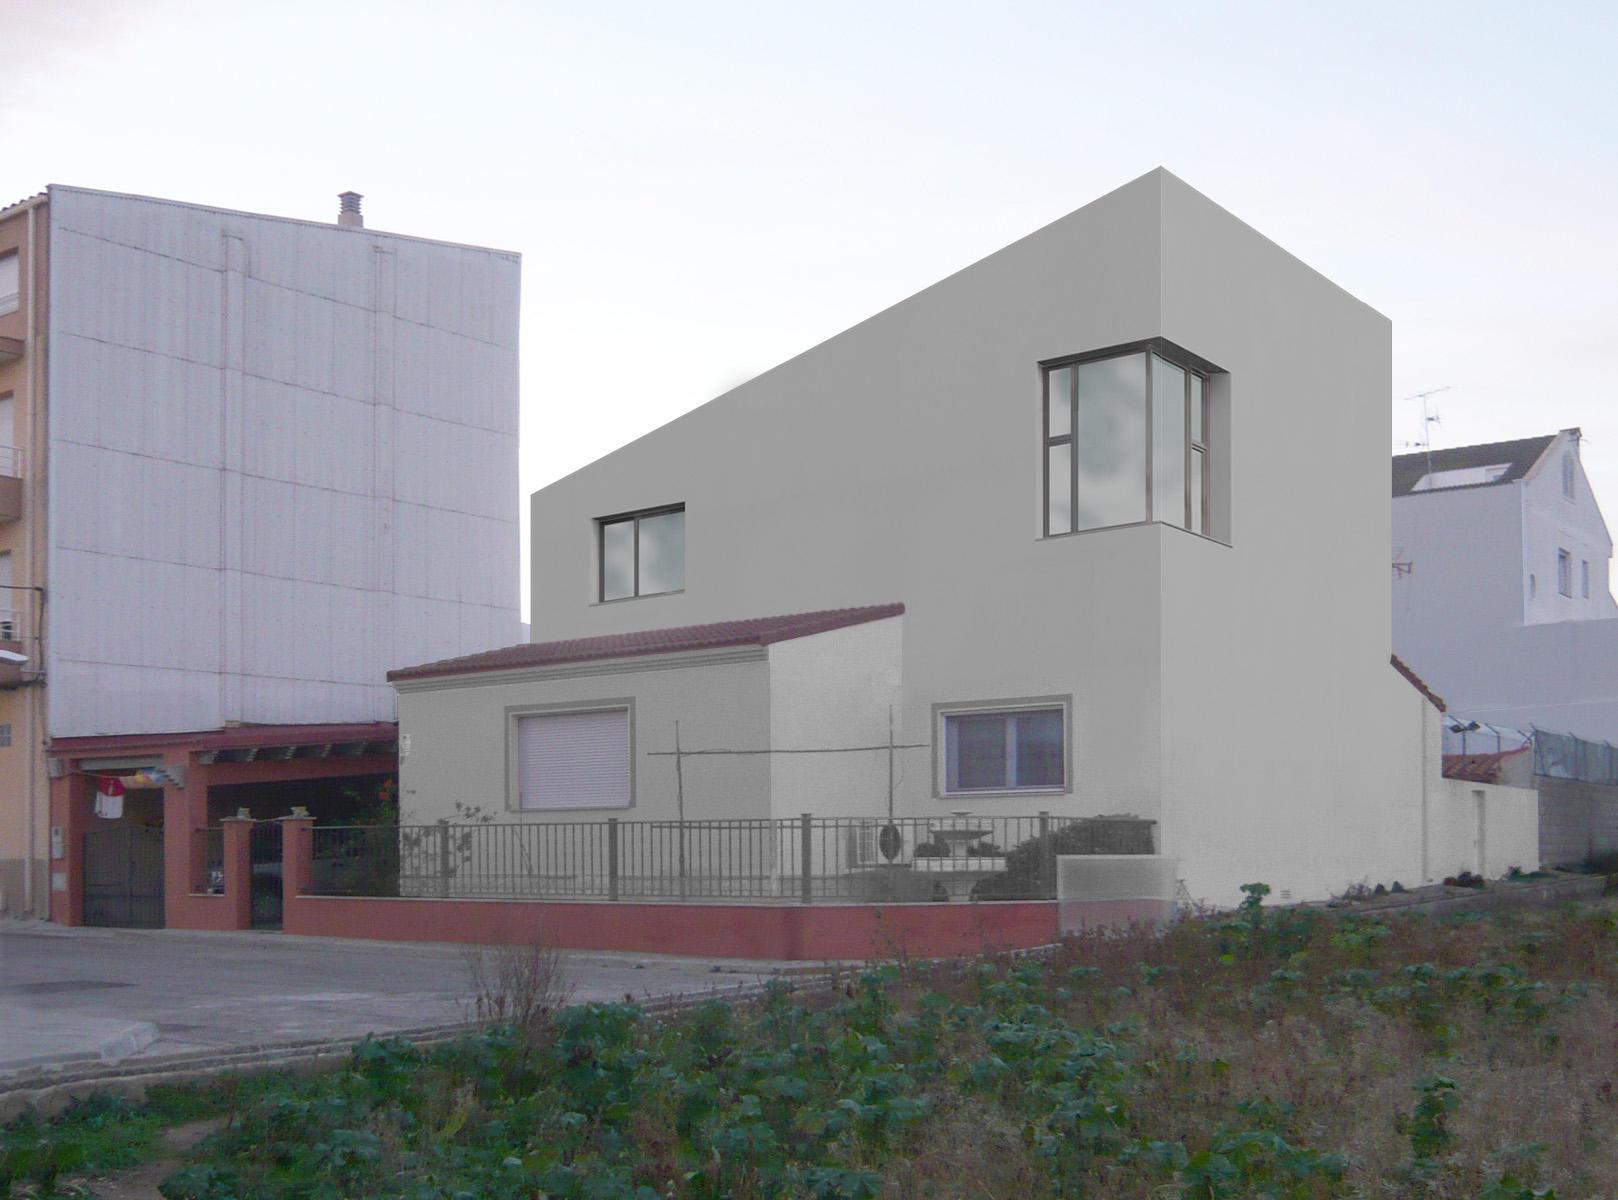 Arquitecto en badalona infobel espa a - Arquitectos en espana ...